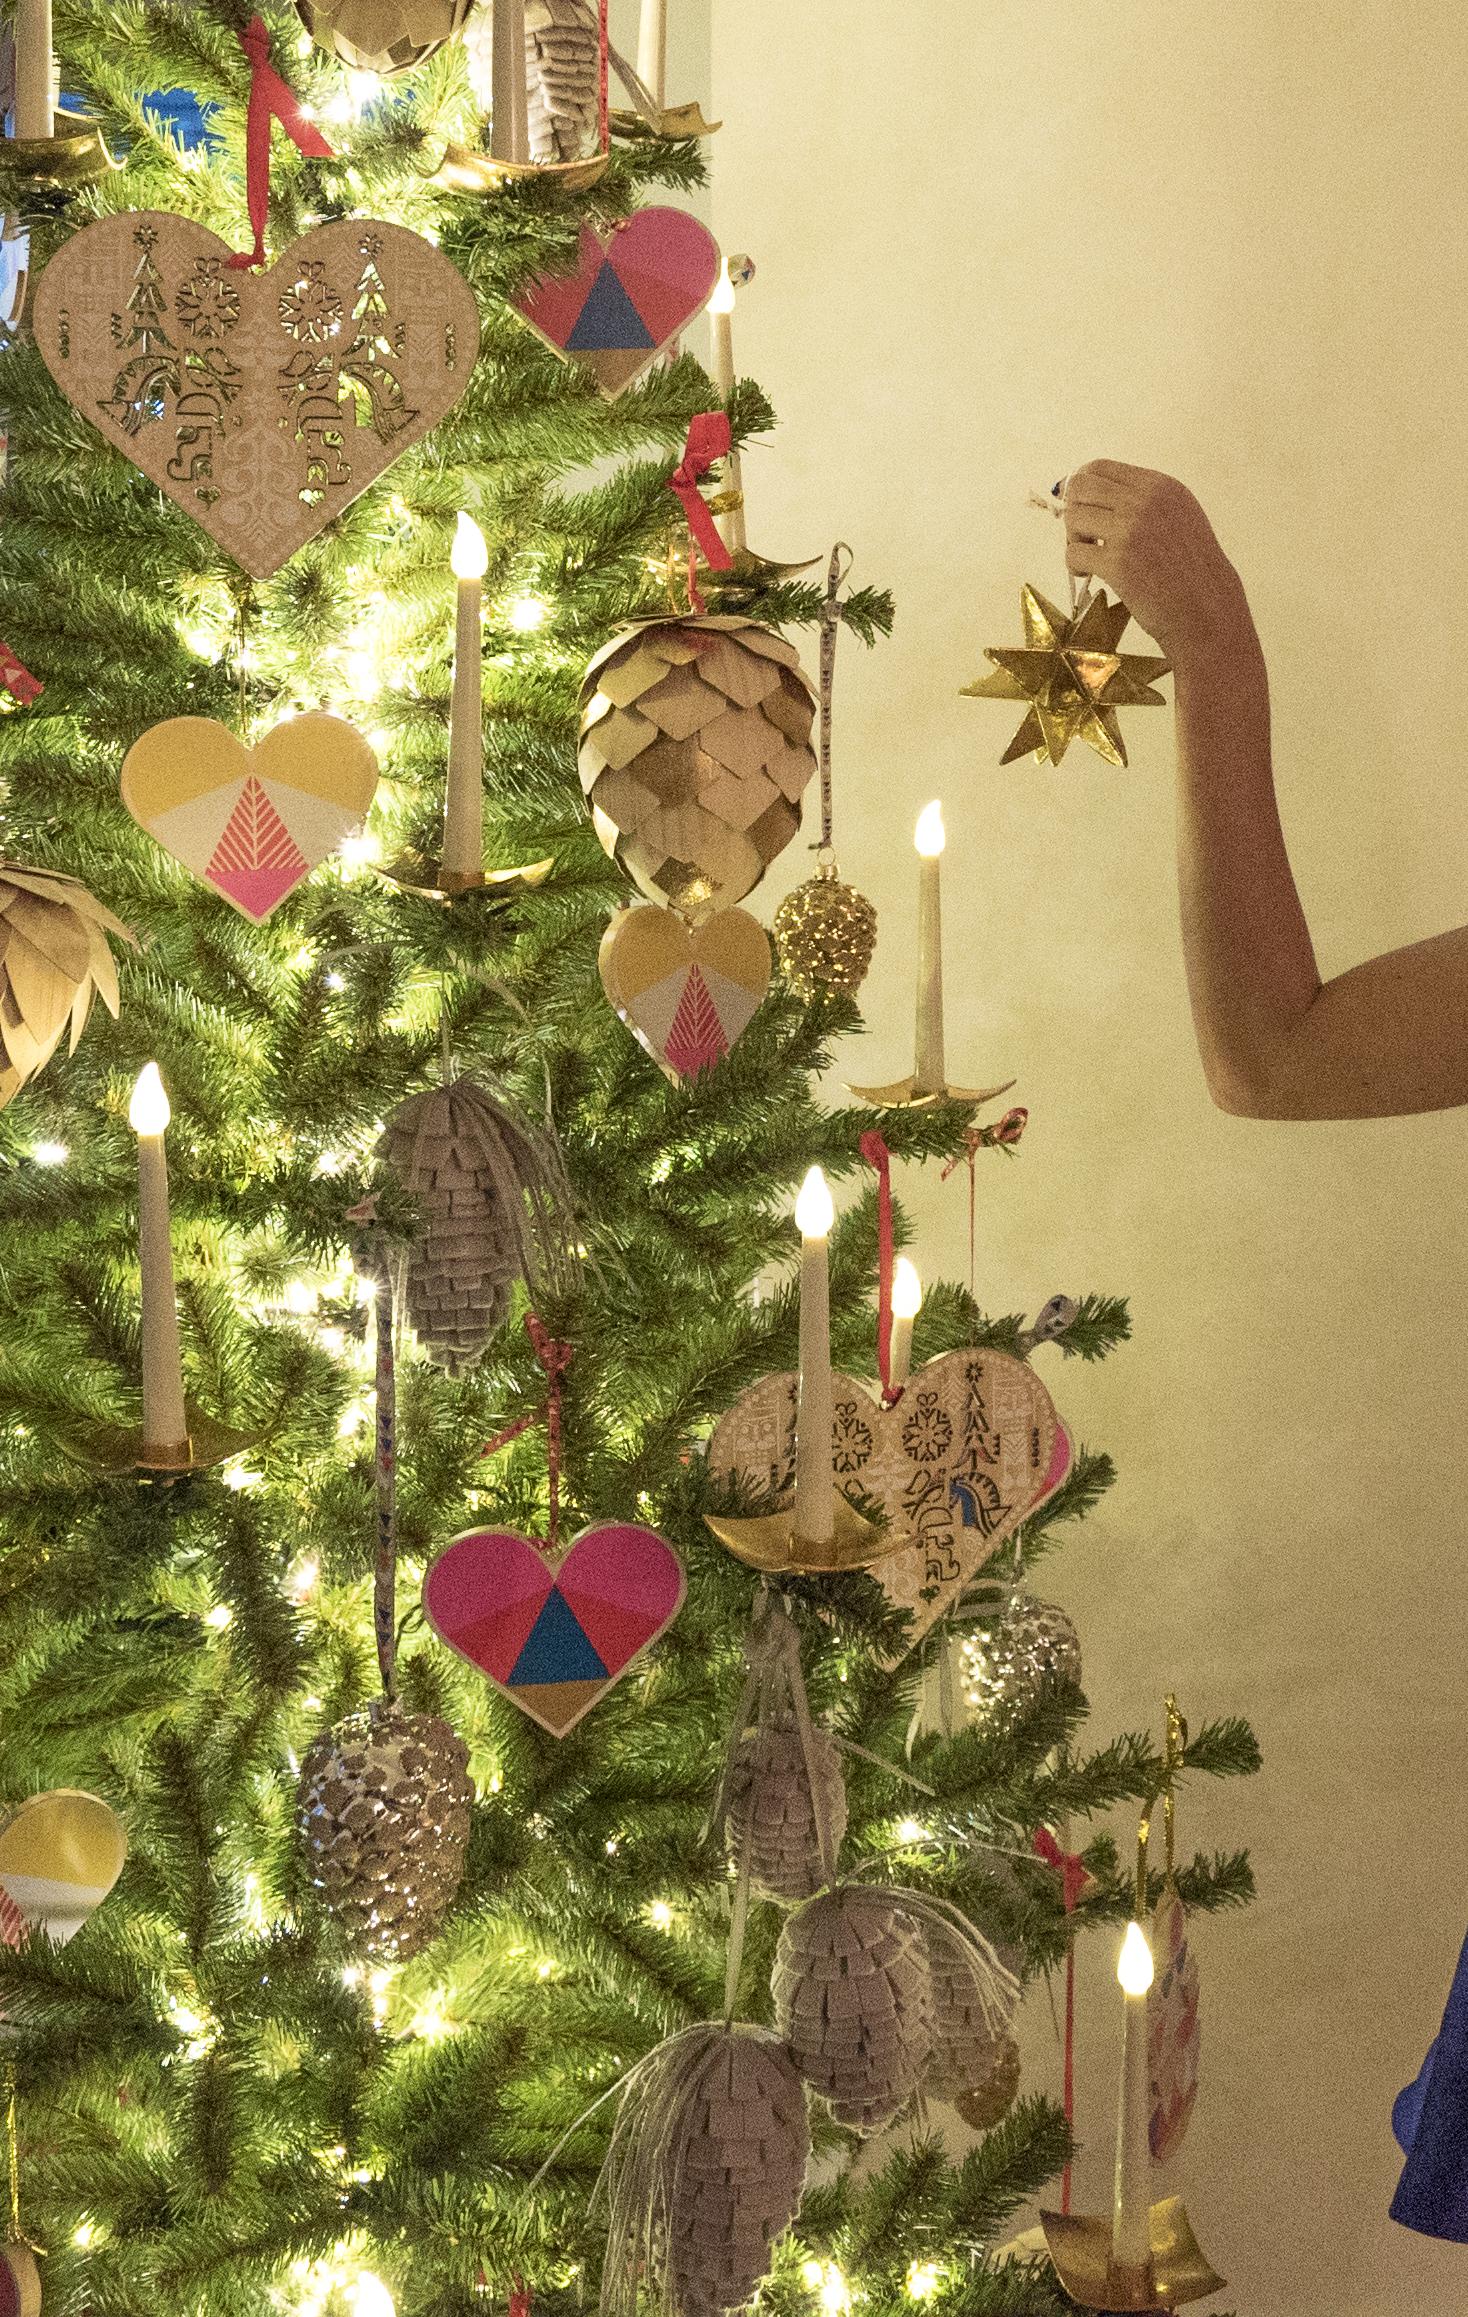 Nordstrom At Home Metallic Star Ornament Nordstrom Christmas Tree Decorations Christmas Christmas Joy